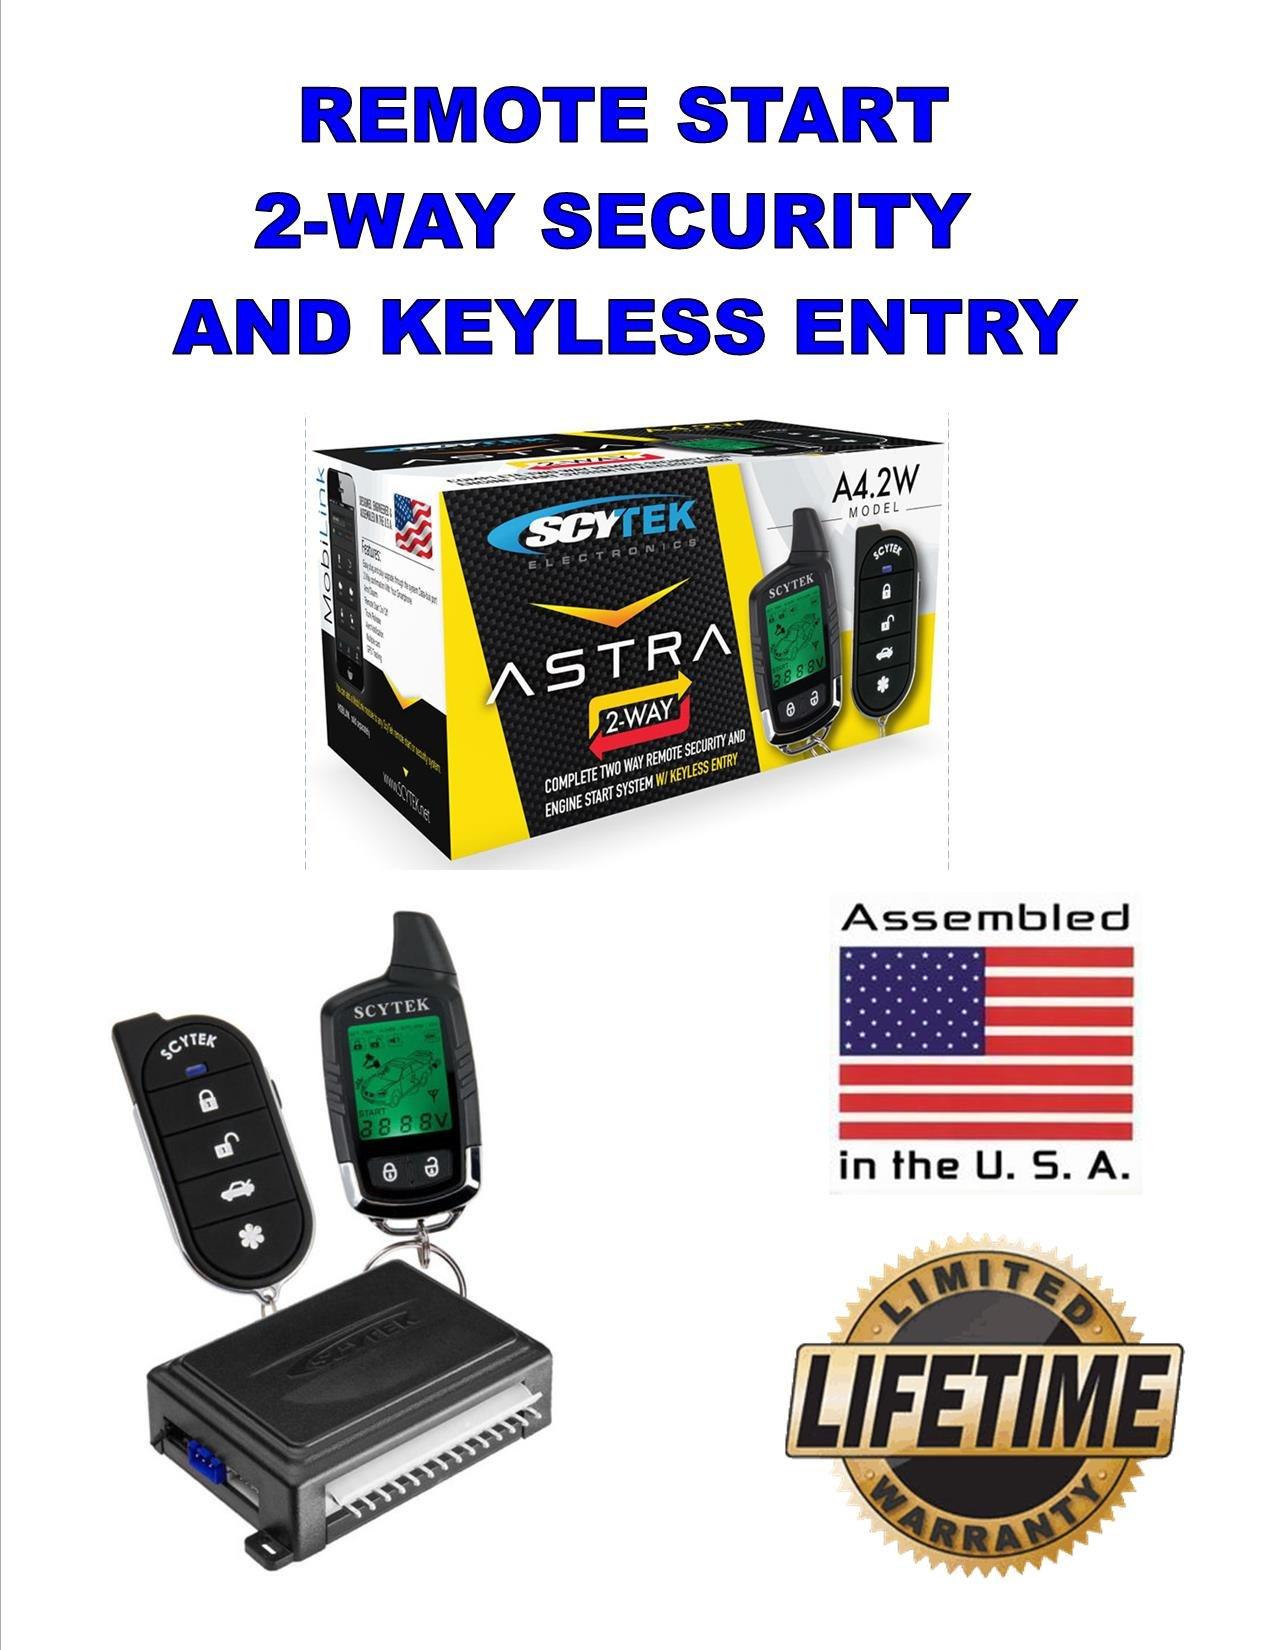 Car Alarm Security System, Keyless Entry 2-Way LCD Remote Start Scytek A4.2W by Astra